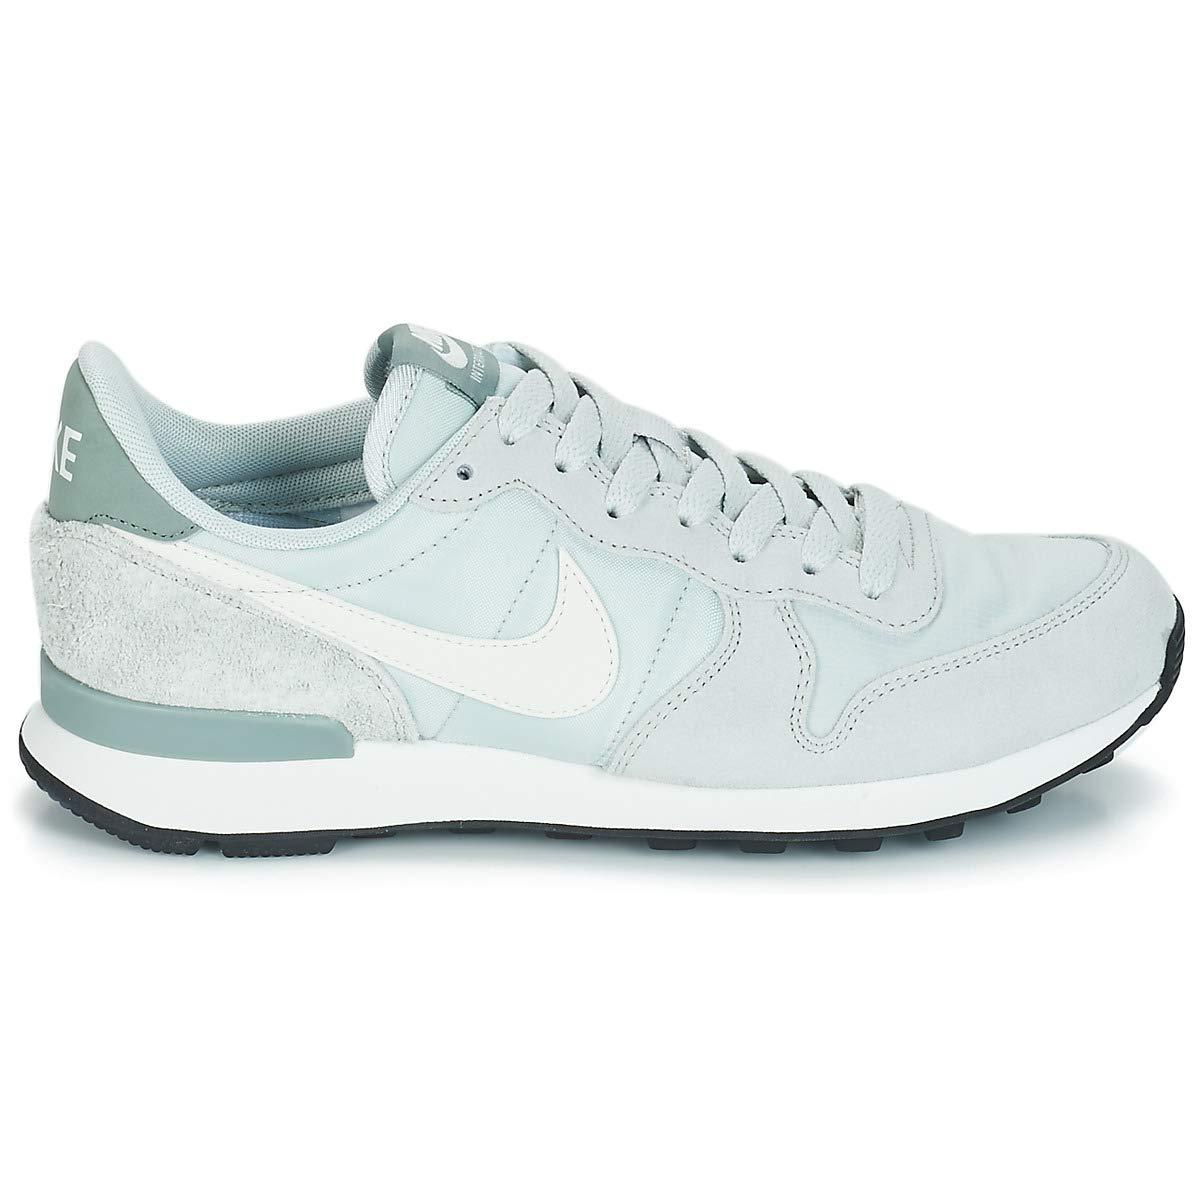 Nike Damen Wmns Damen SneakersSchuhe Wmns Internationalist Nike j5RcL4A3q